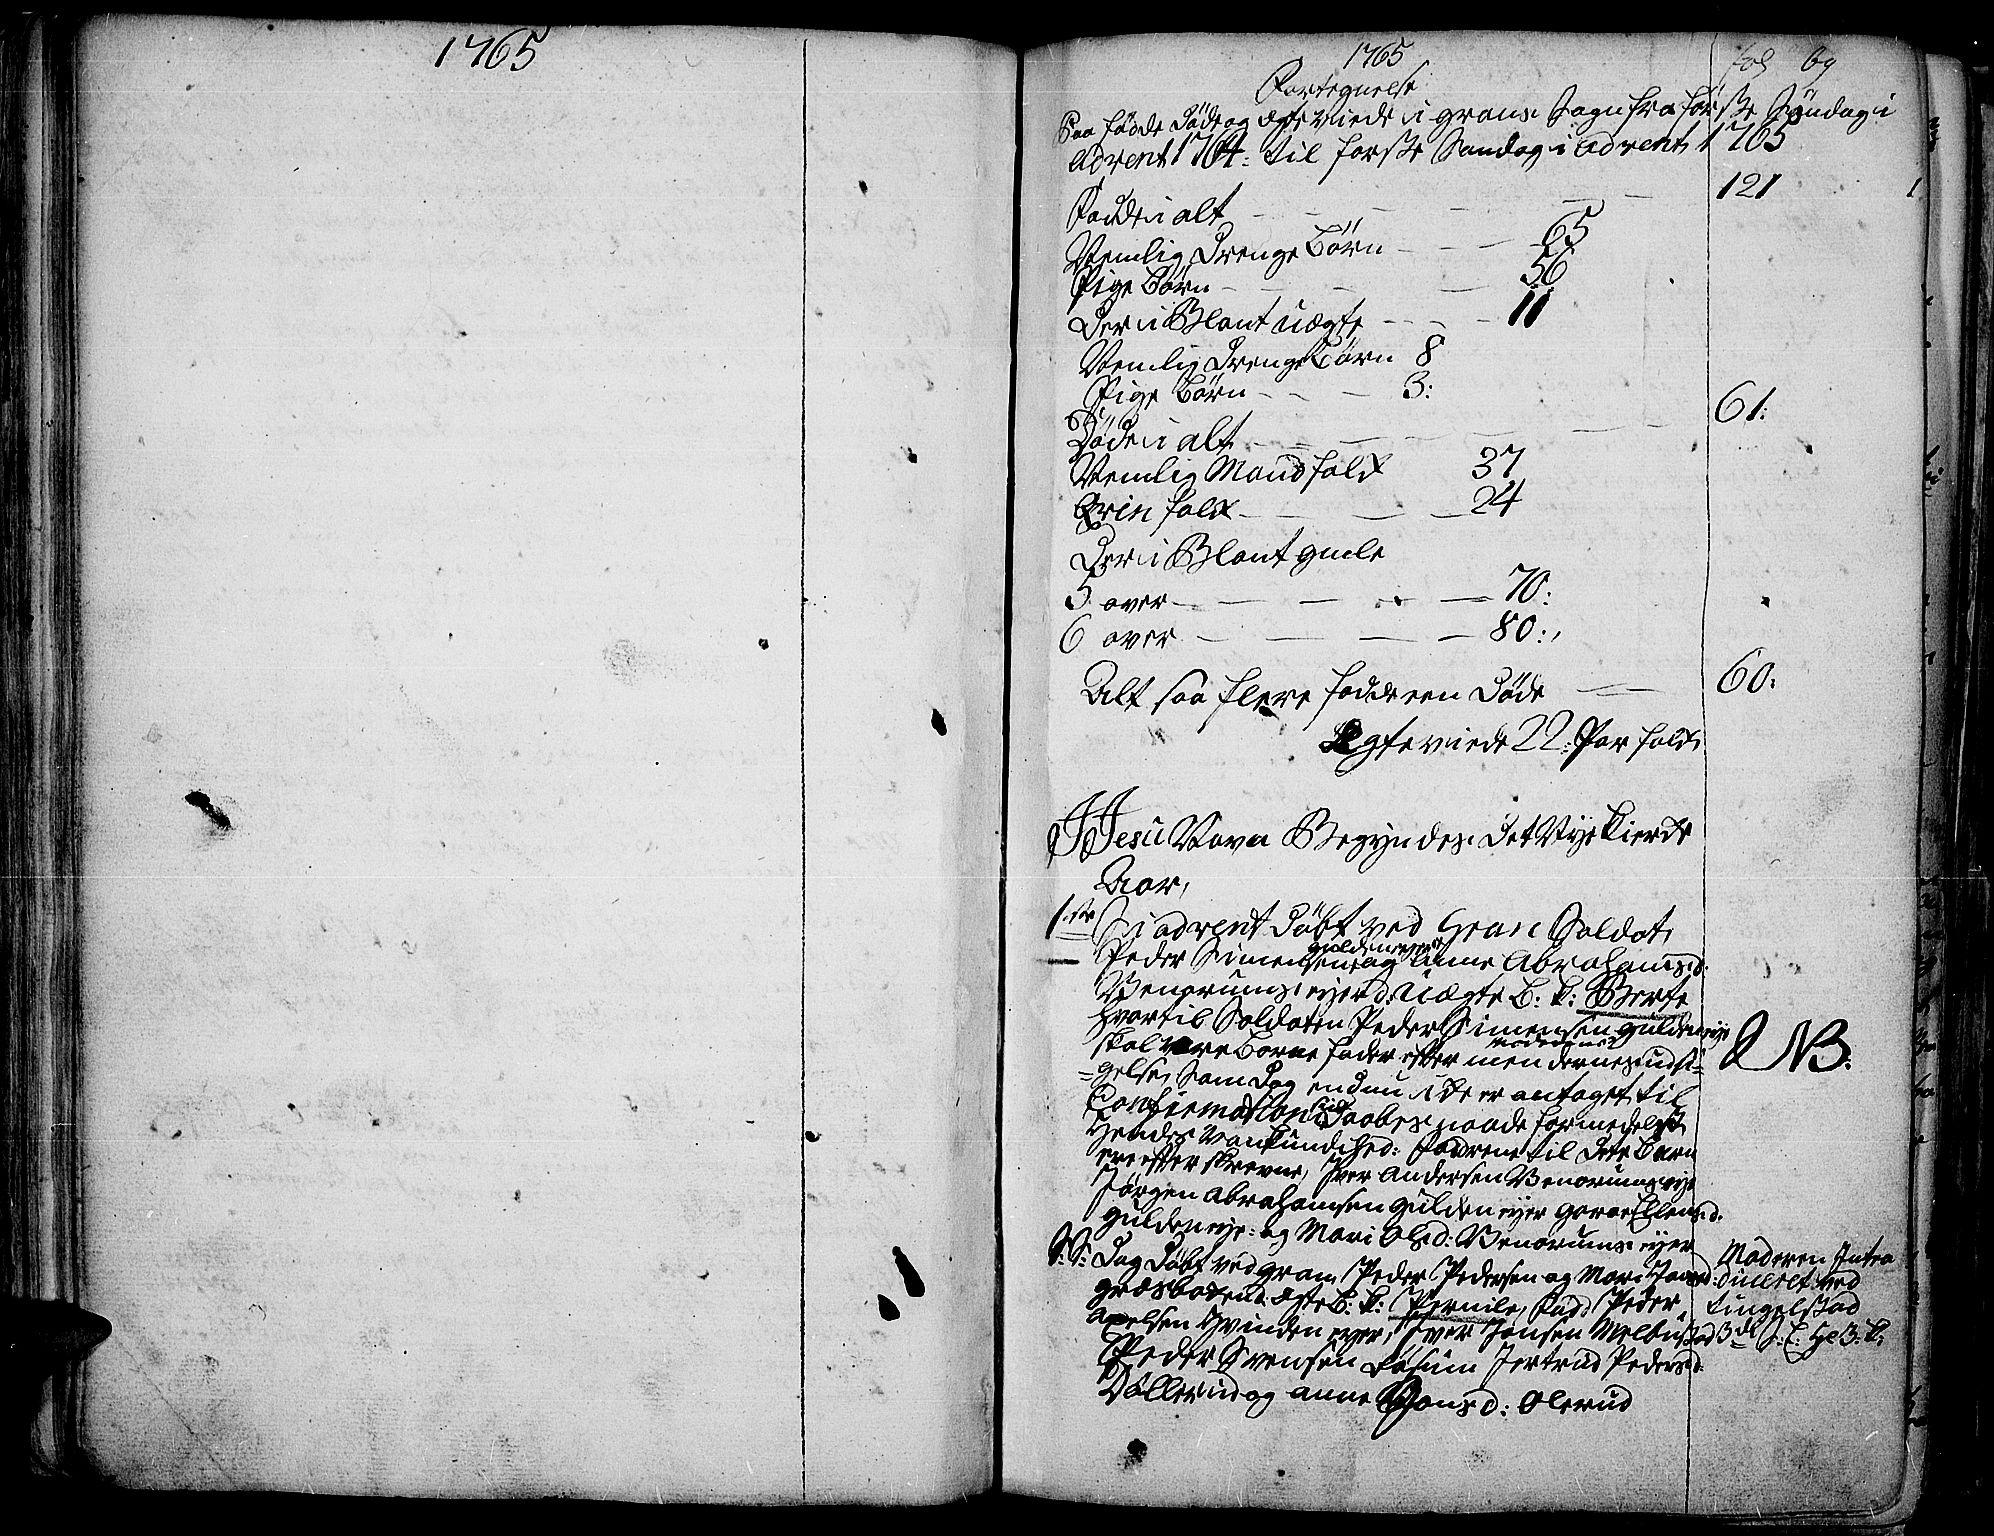 SAH, Gran prestekontor, Ministerialbok nr. 4, 1759-1775, s. 69